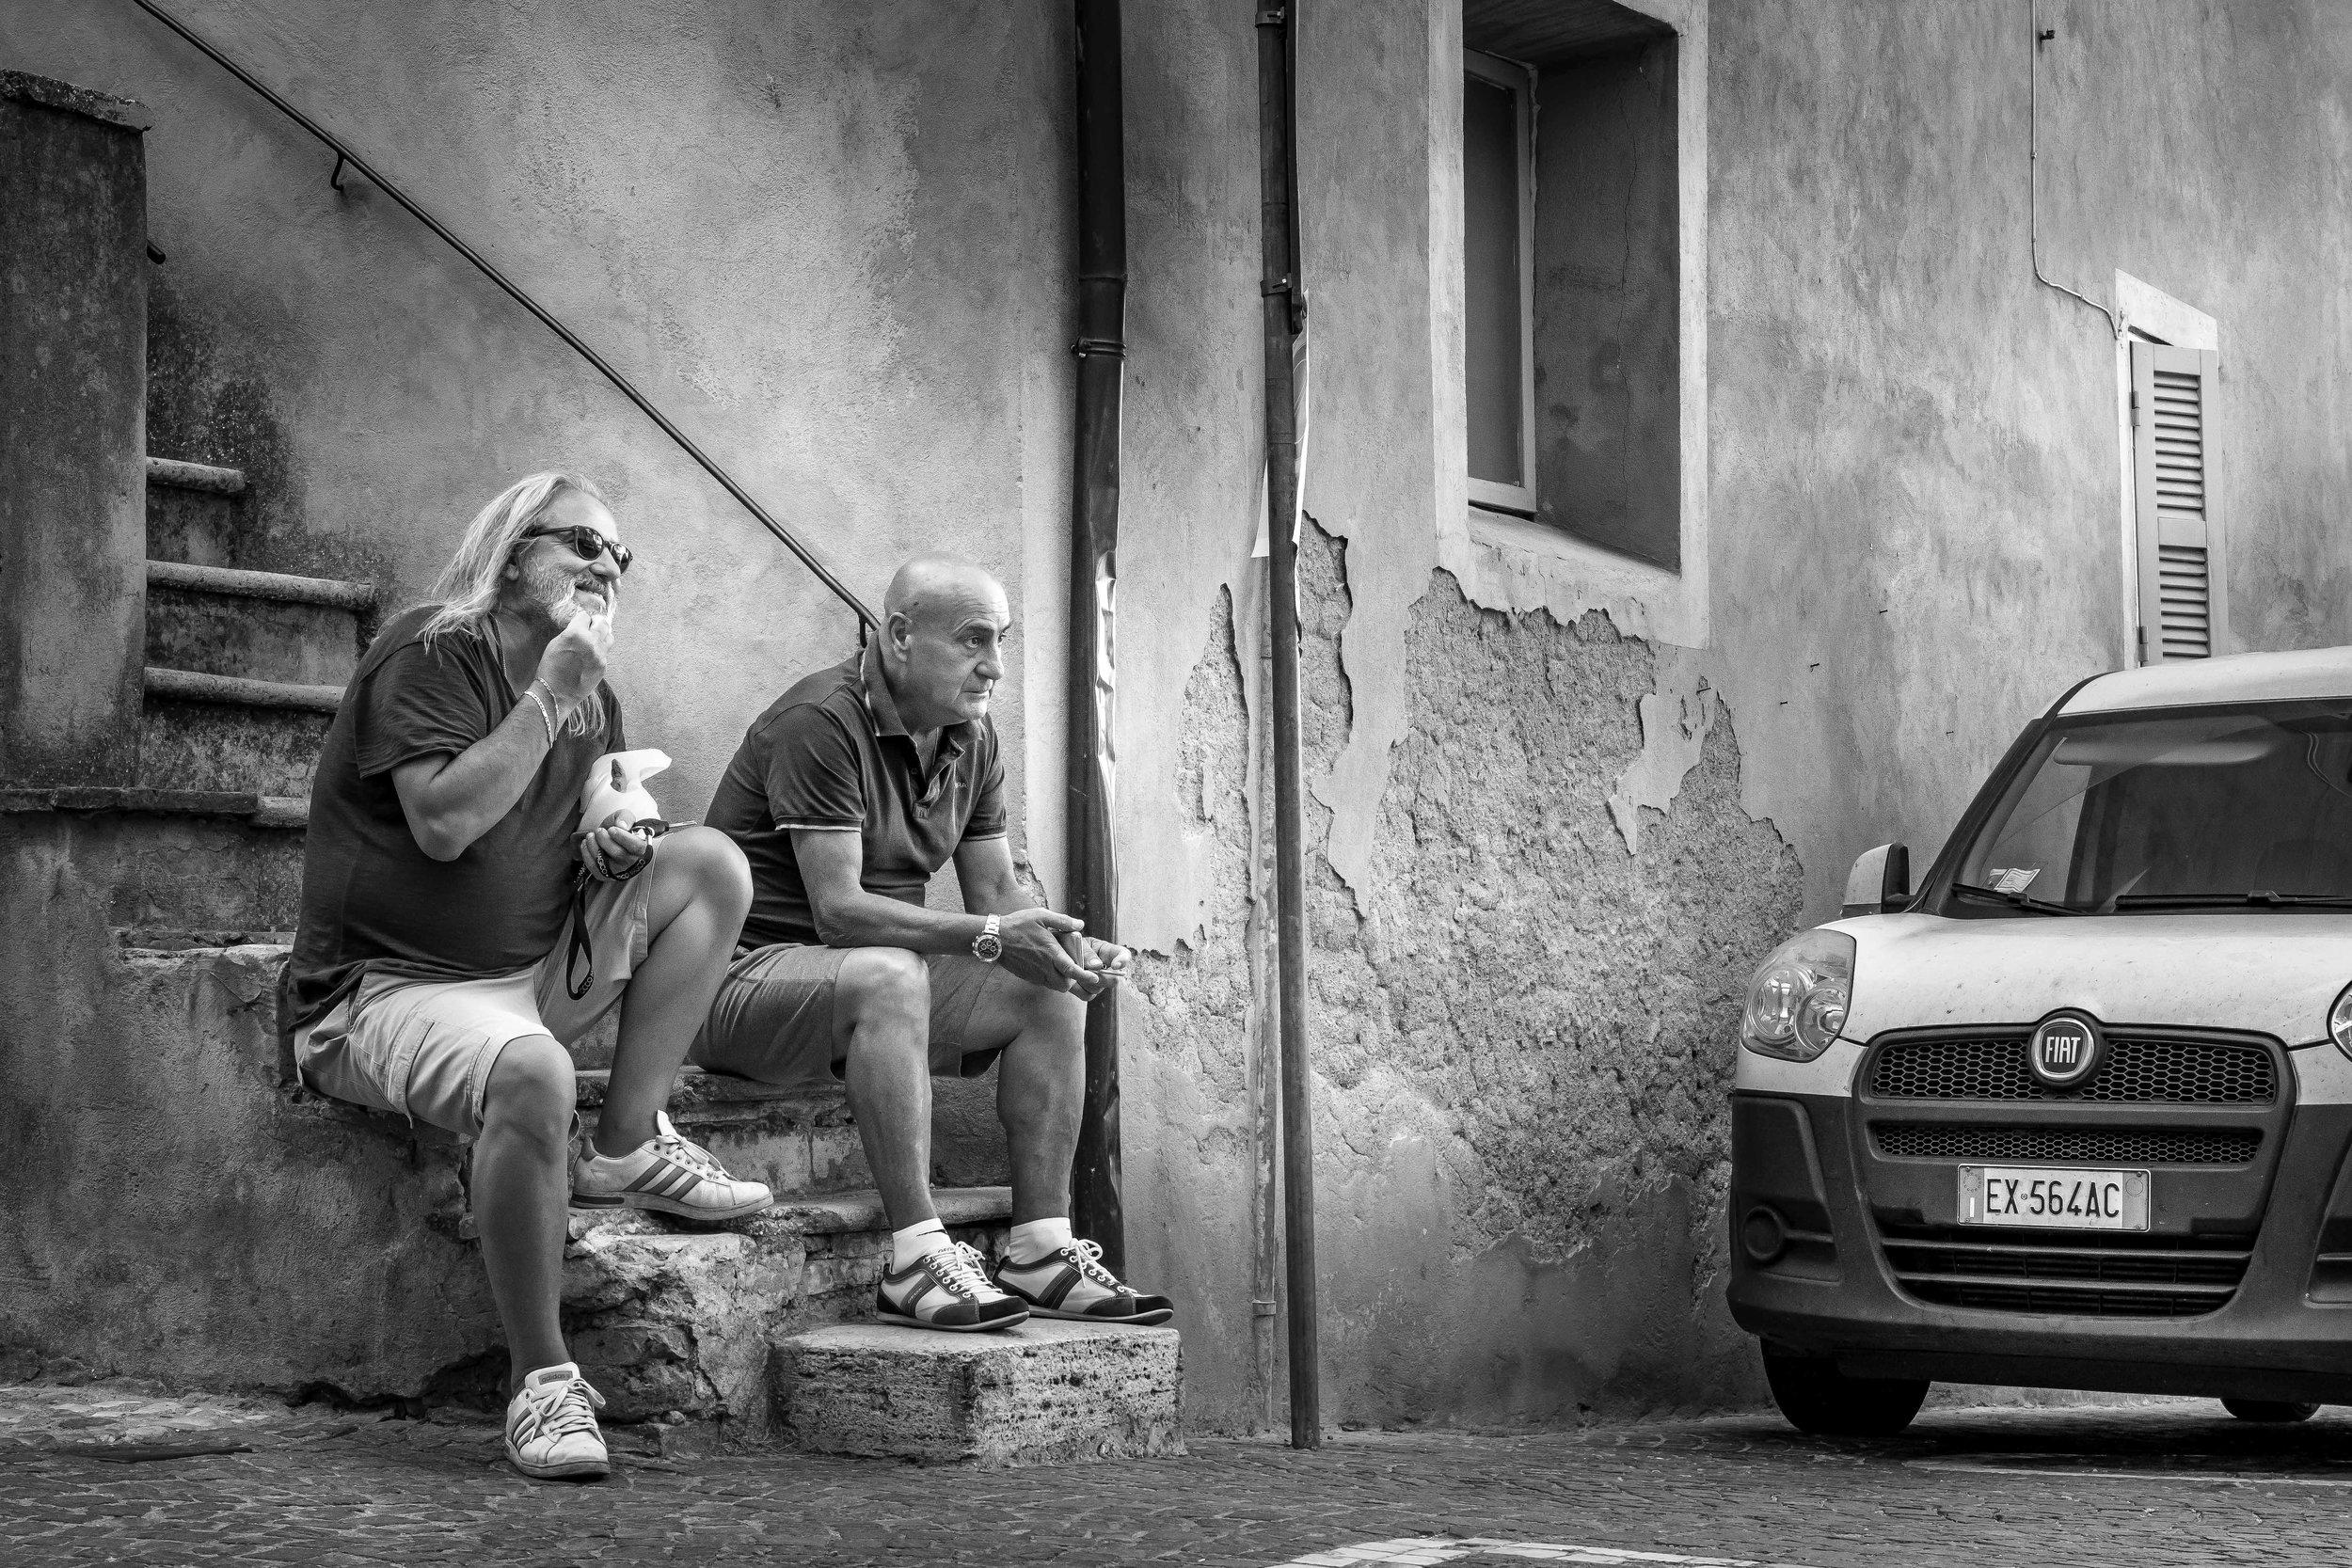 viewfinder-straatfotografie-oude-mannen-in-Collevecchio-13.jpg